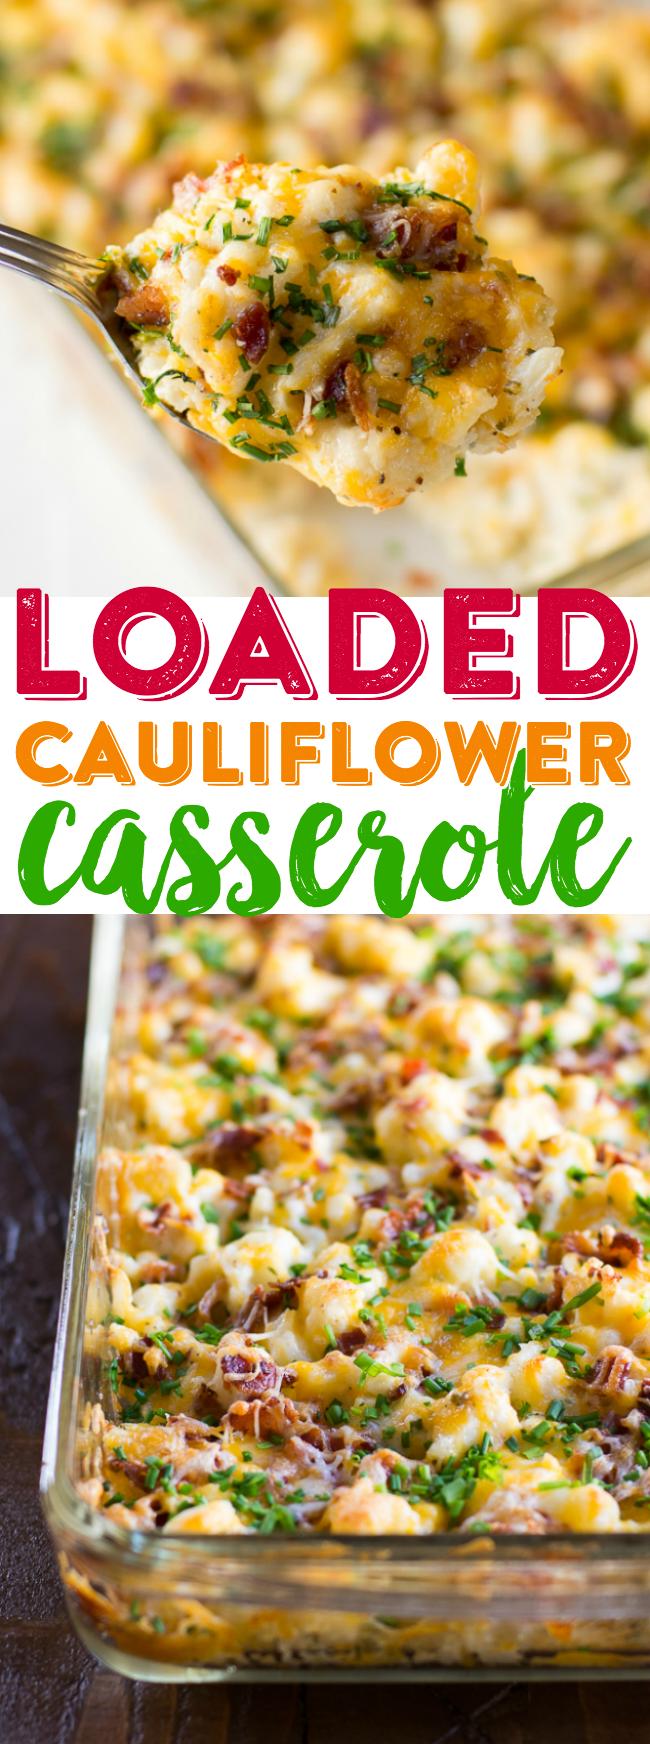 Photo of Loaded Cauliflower Casserole Recipe